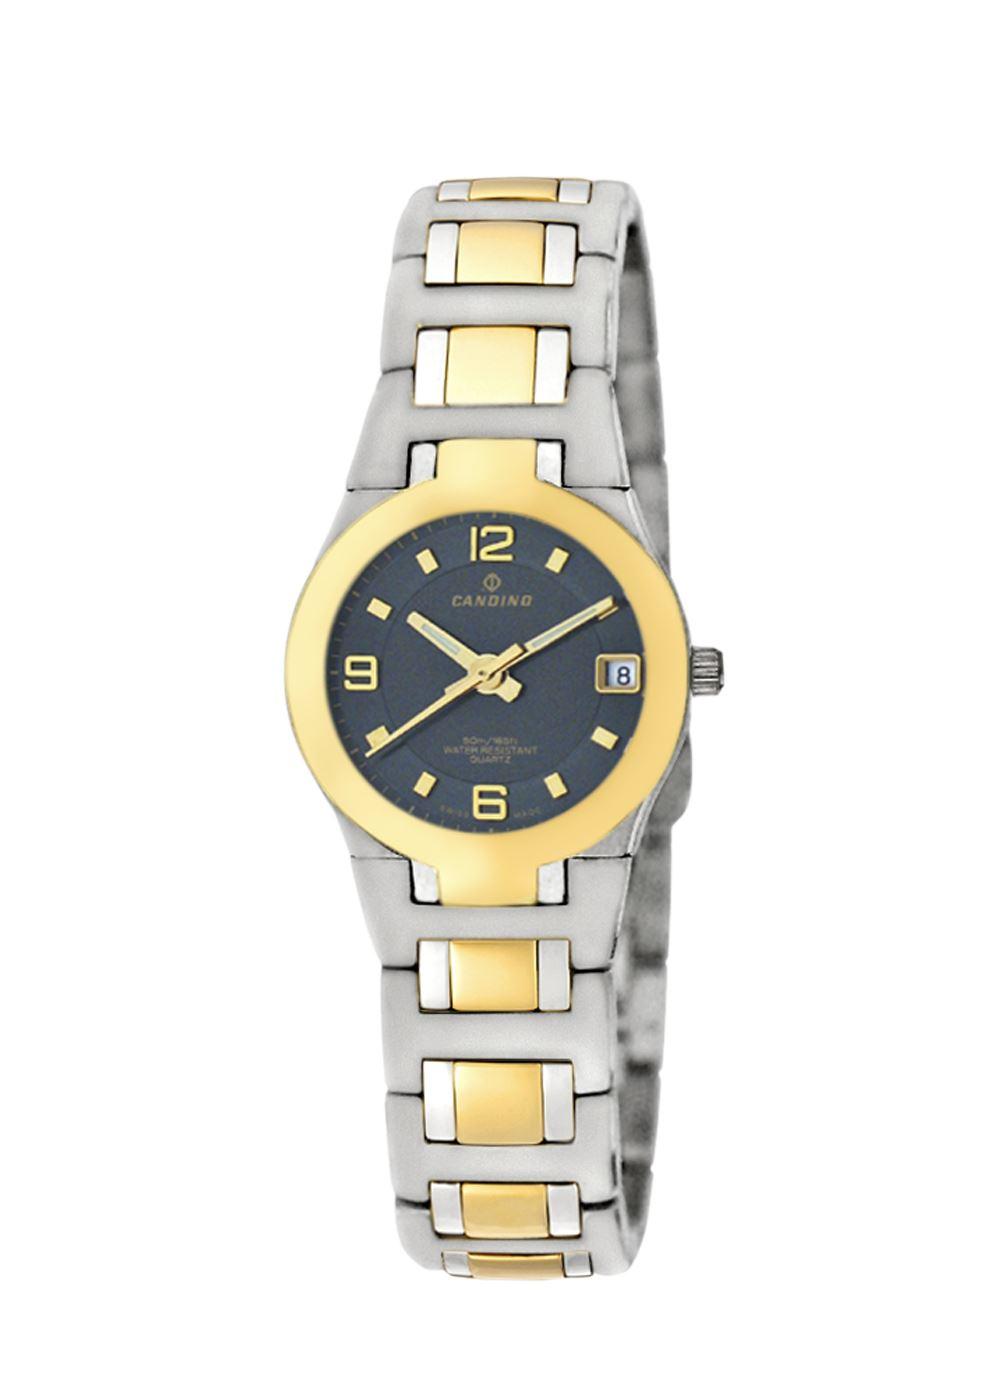 Jaguar & More - Γυναικείο Ελβετικό Ρολόι CANDINO